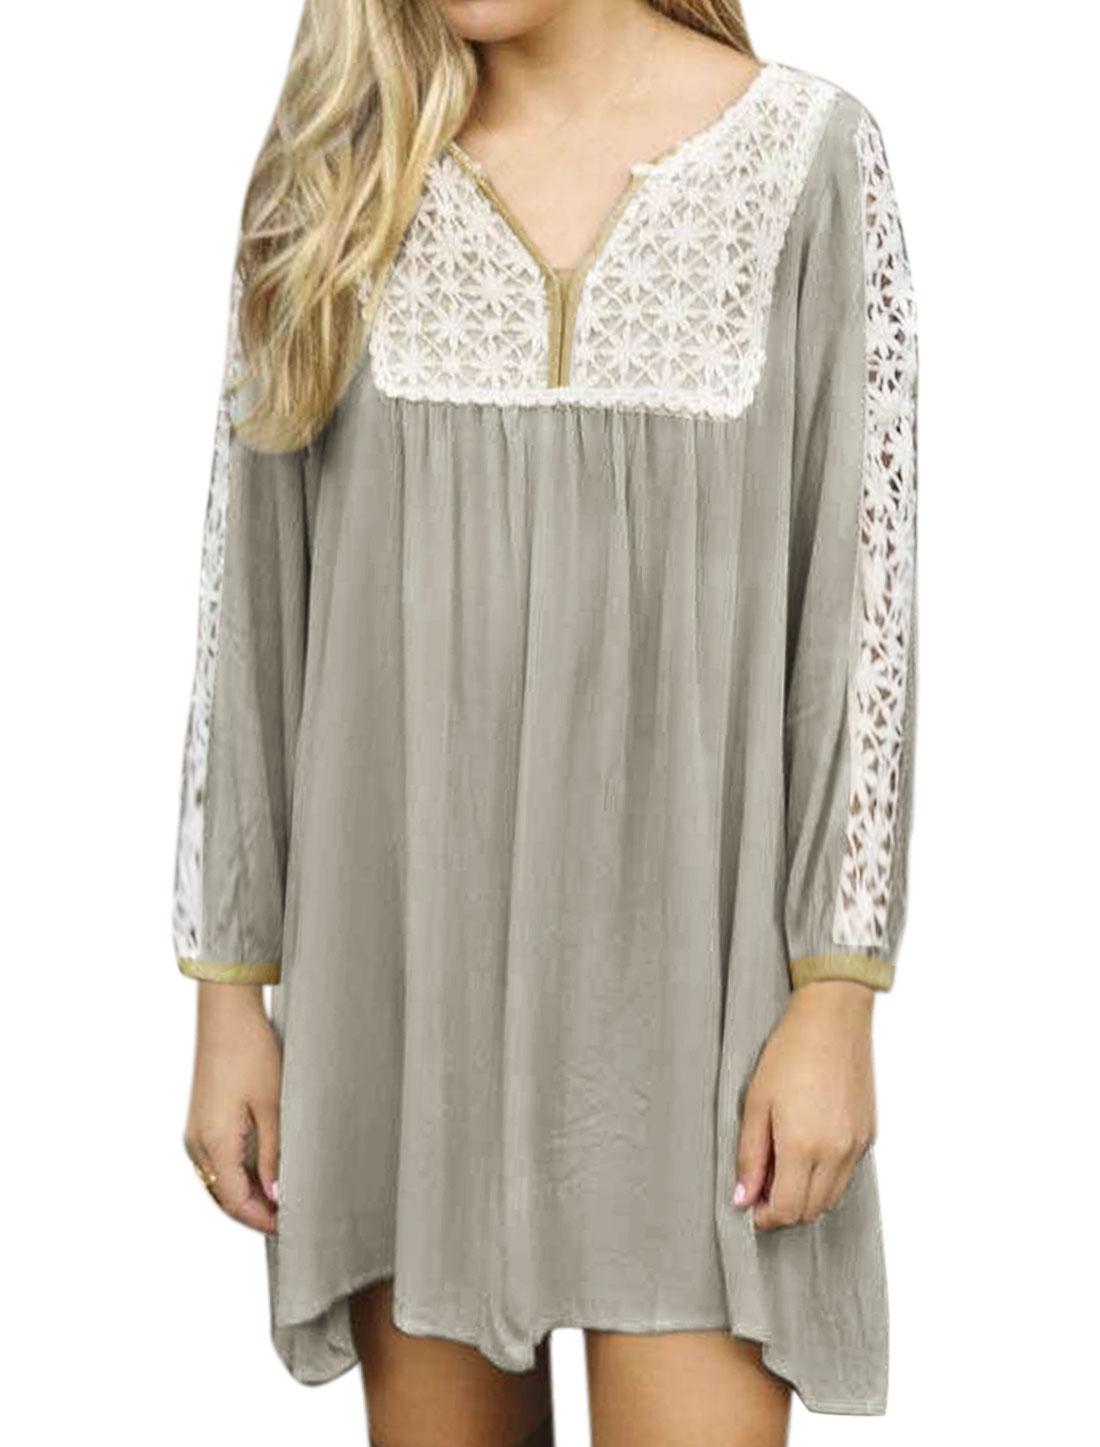 Women Split Neck Crochet Semi Sheer Loose Tunic Dress Gray M